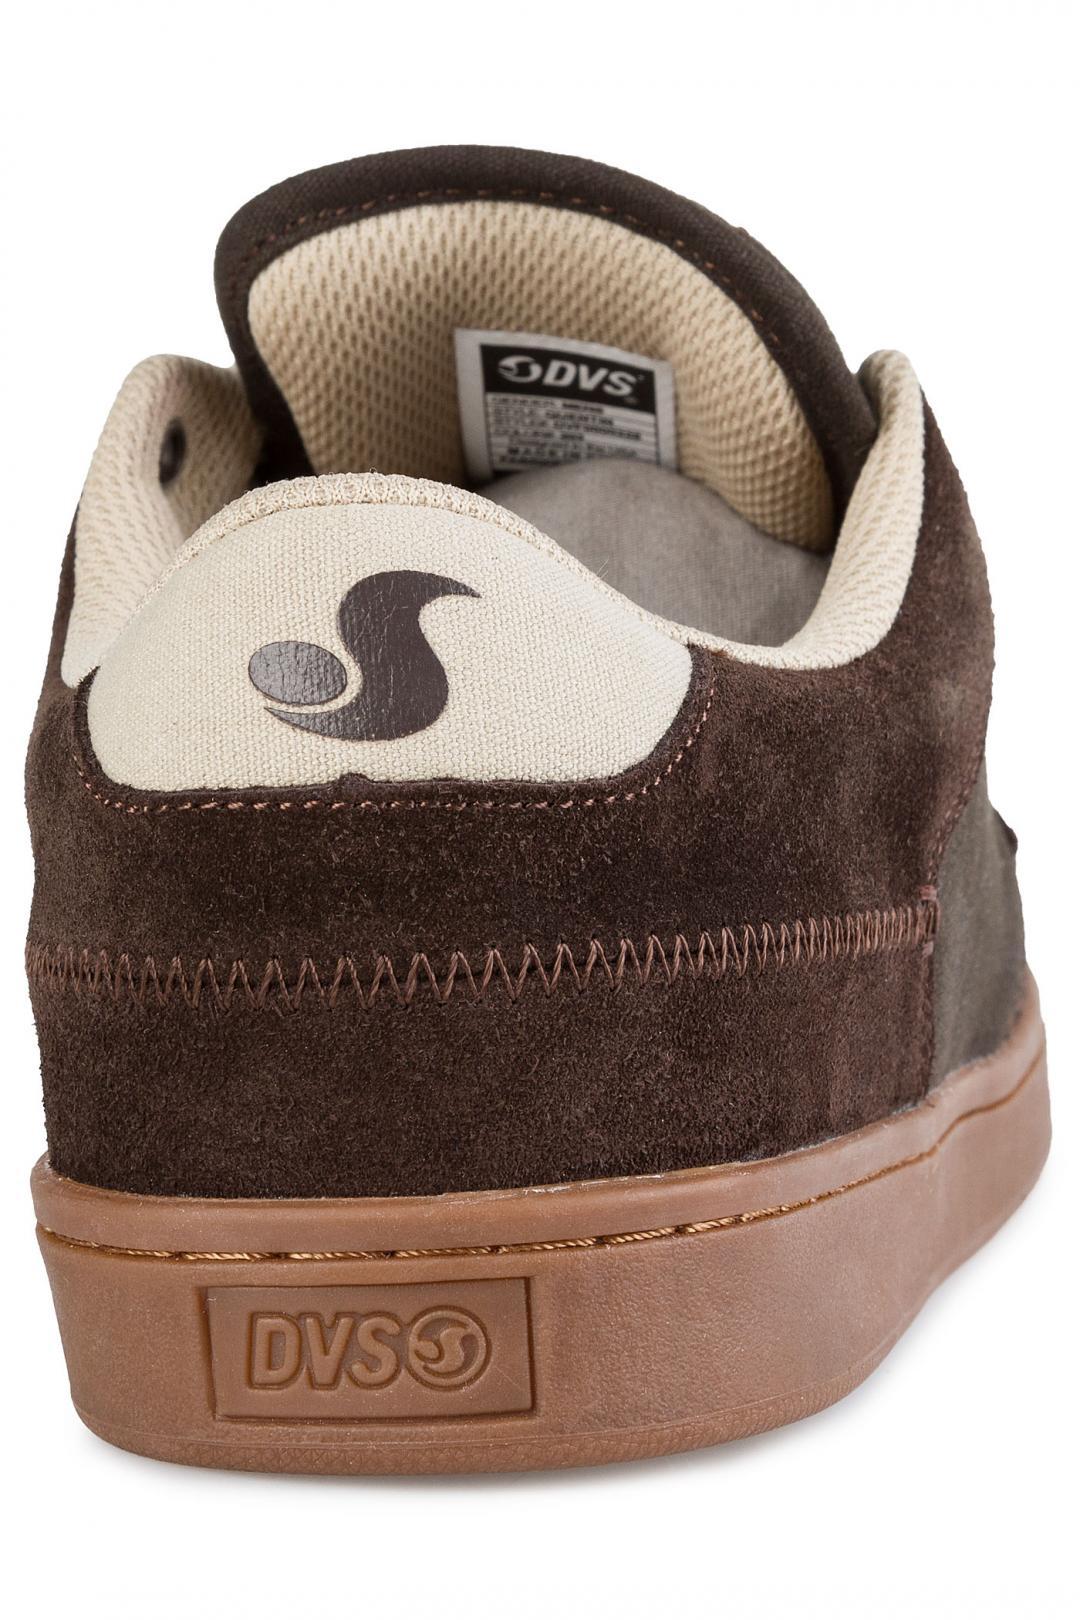 Uomo DVS Quentin Suede chocolate | Sneaker